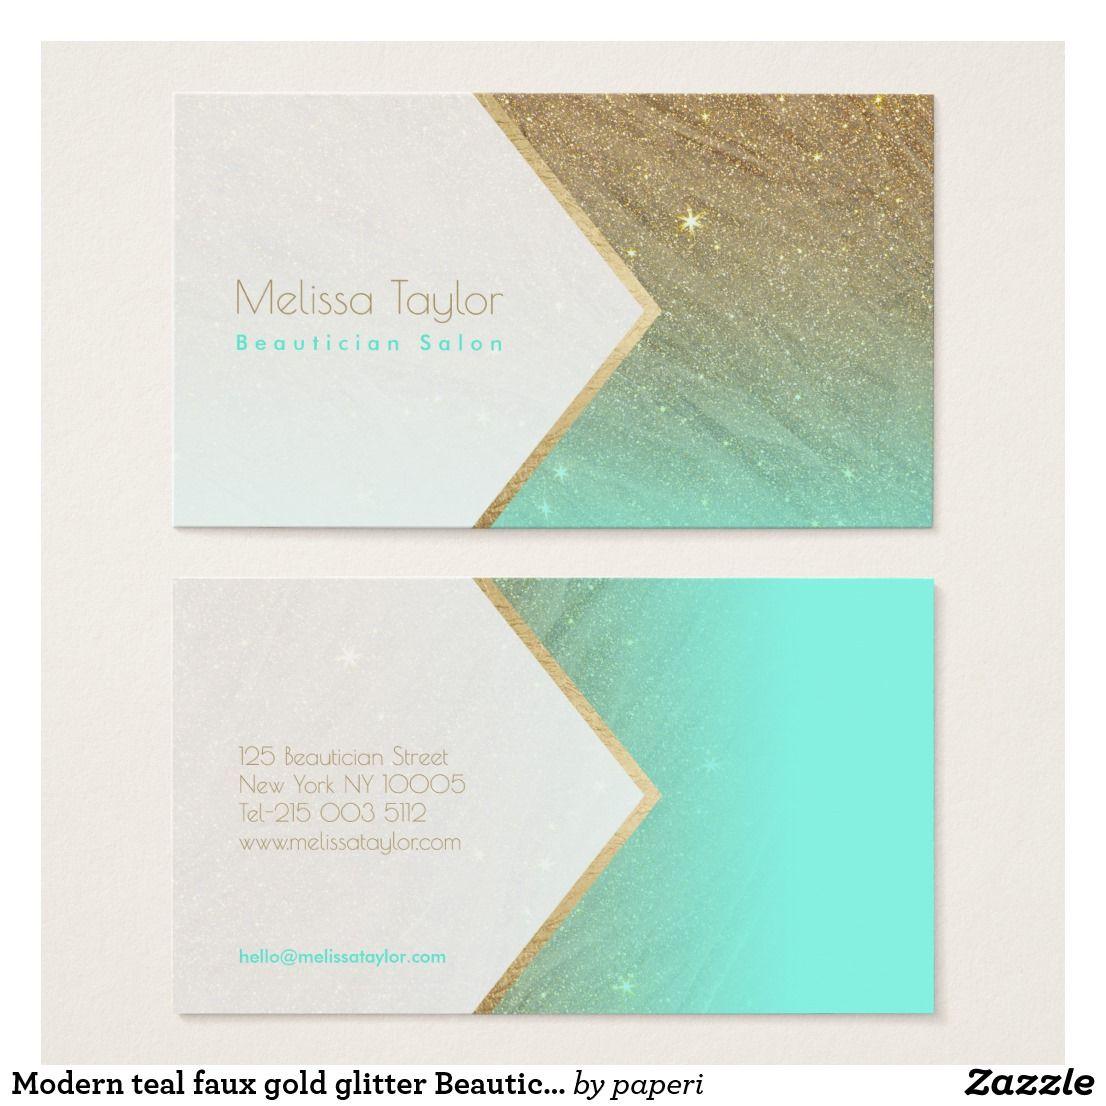 Modern teal faux gold glitter Beautician Salon Визитки